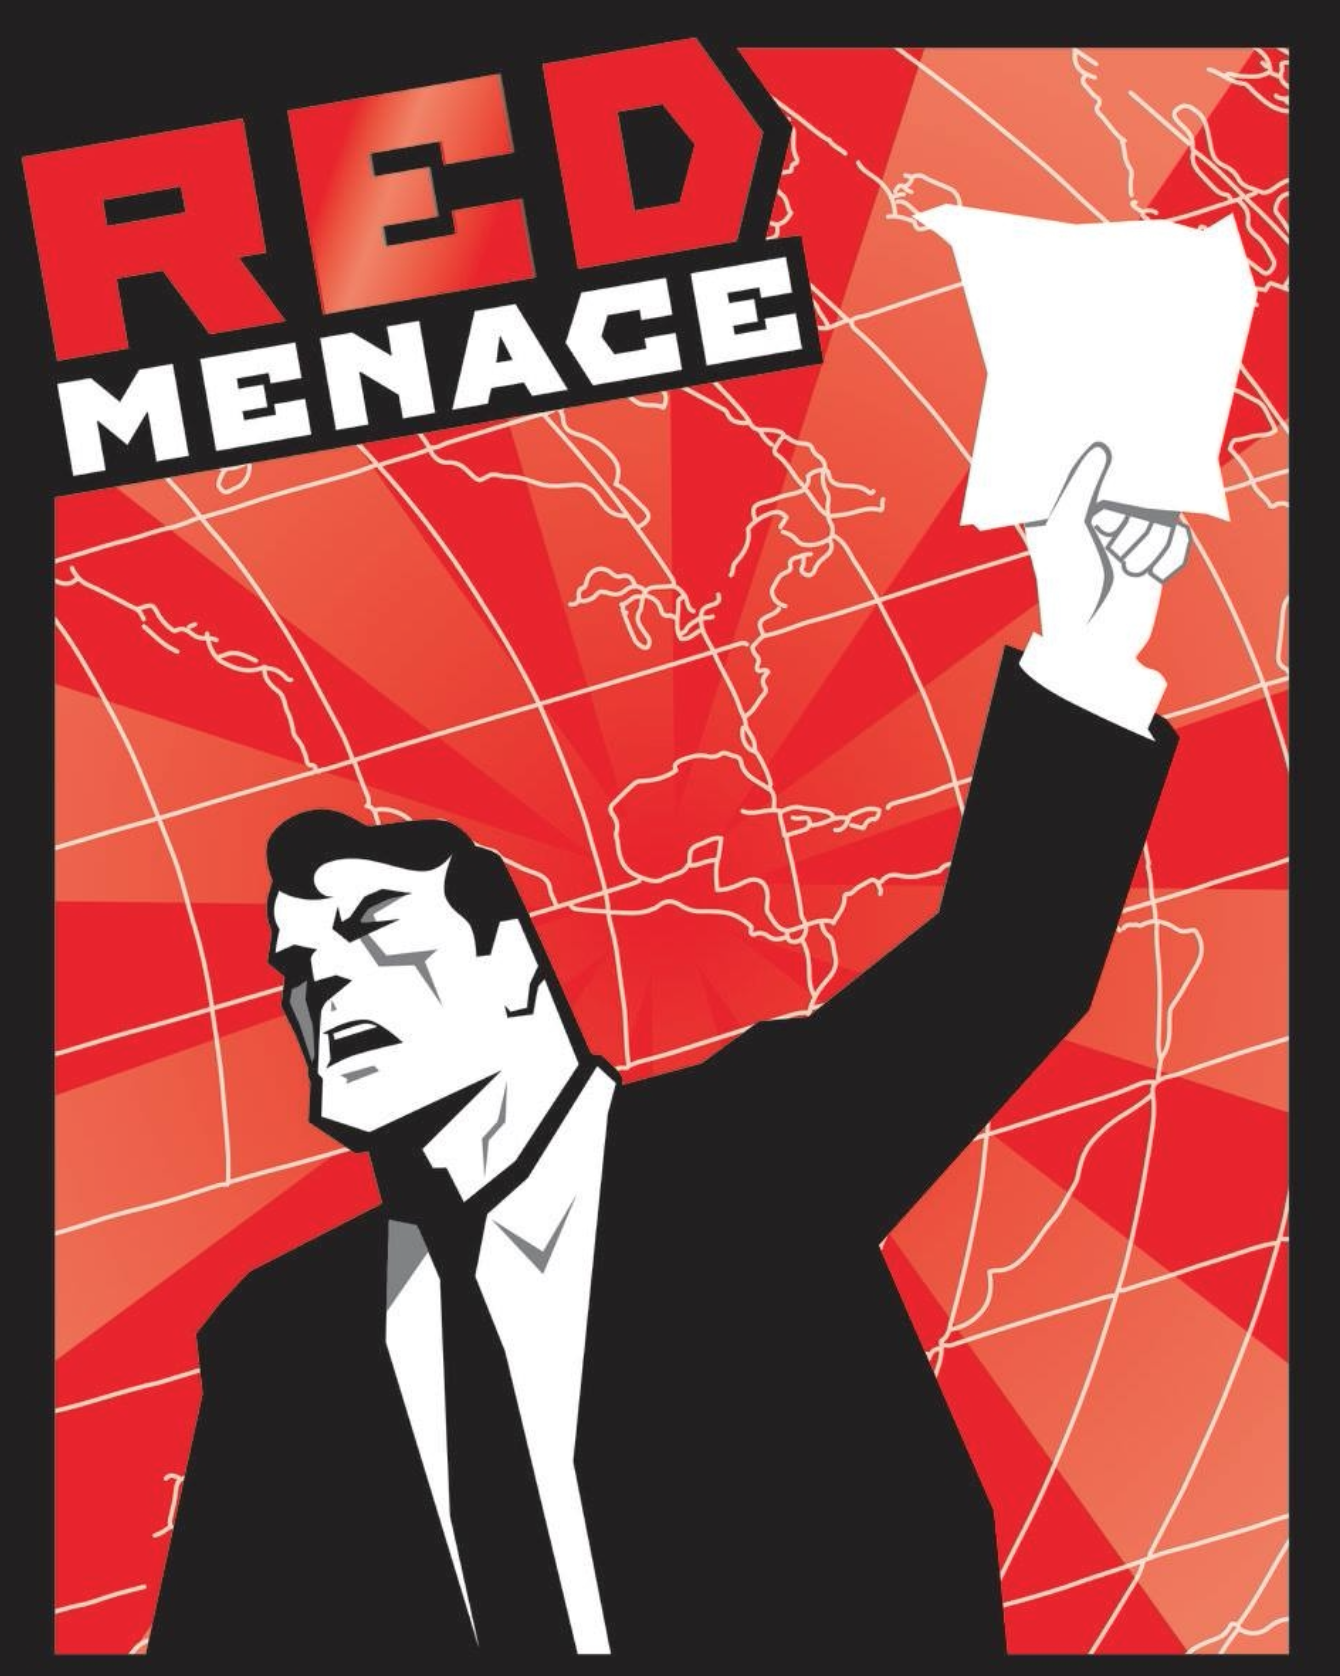 Red+Menace.png